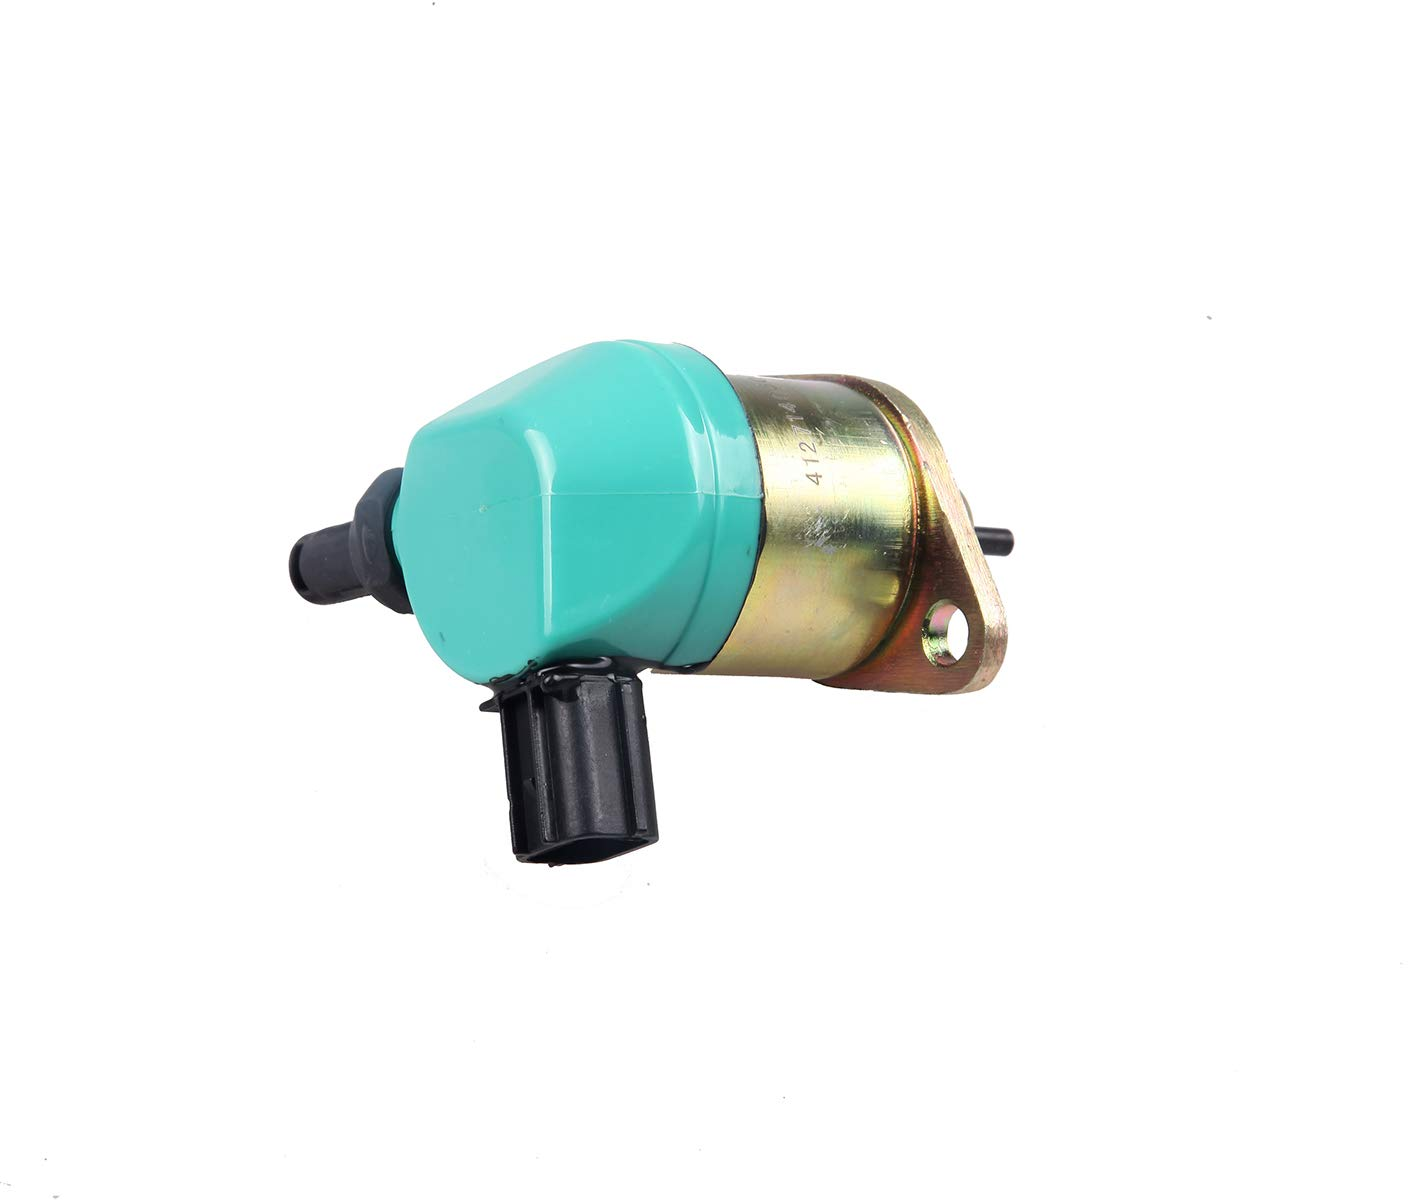 KEYOPO Stop Solenoid 12V 17208-60015 17208-60016 17208-60017 17208-60010 for Kubota D905 D1005 D1105 V1205 V1305 V1505 Engine Mower Excavator Tractor